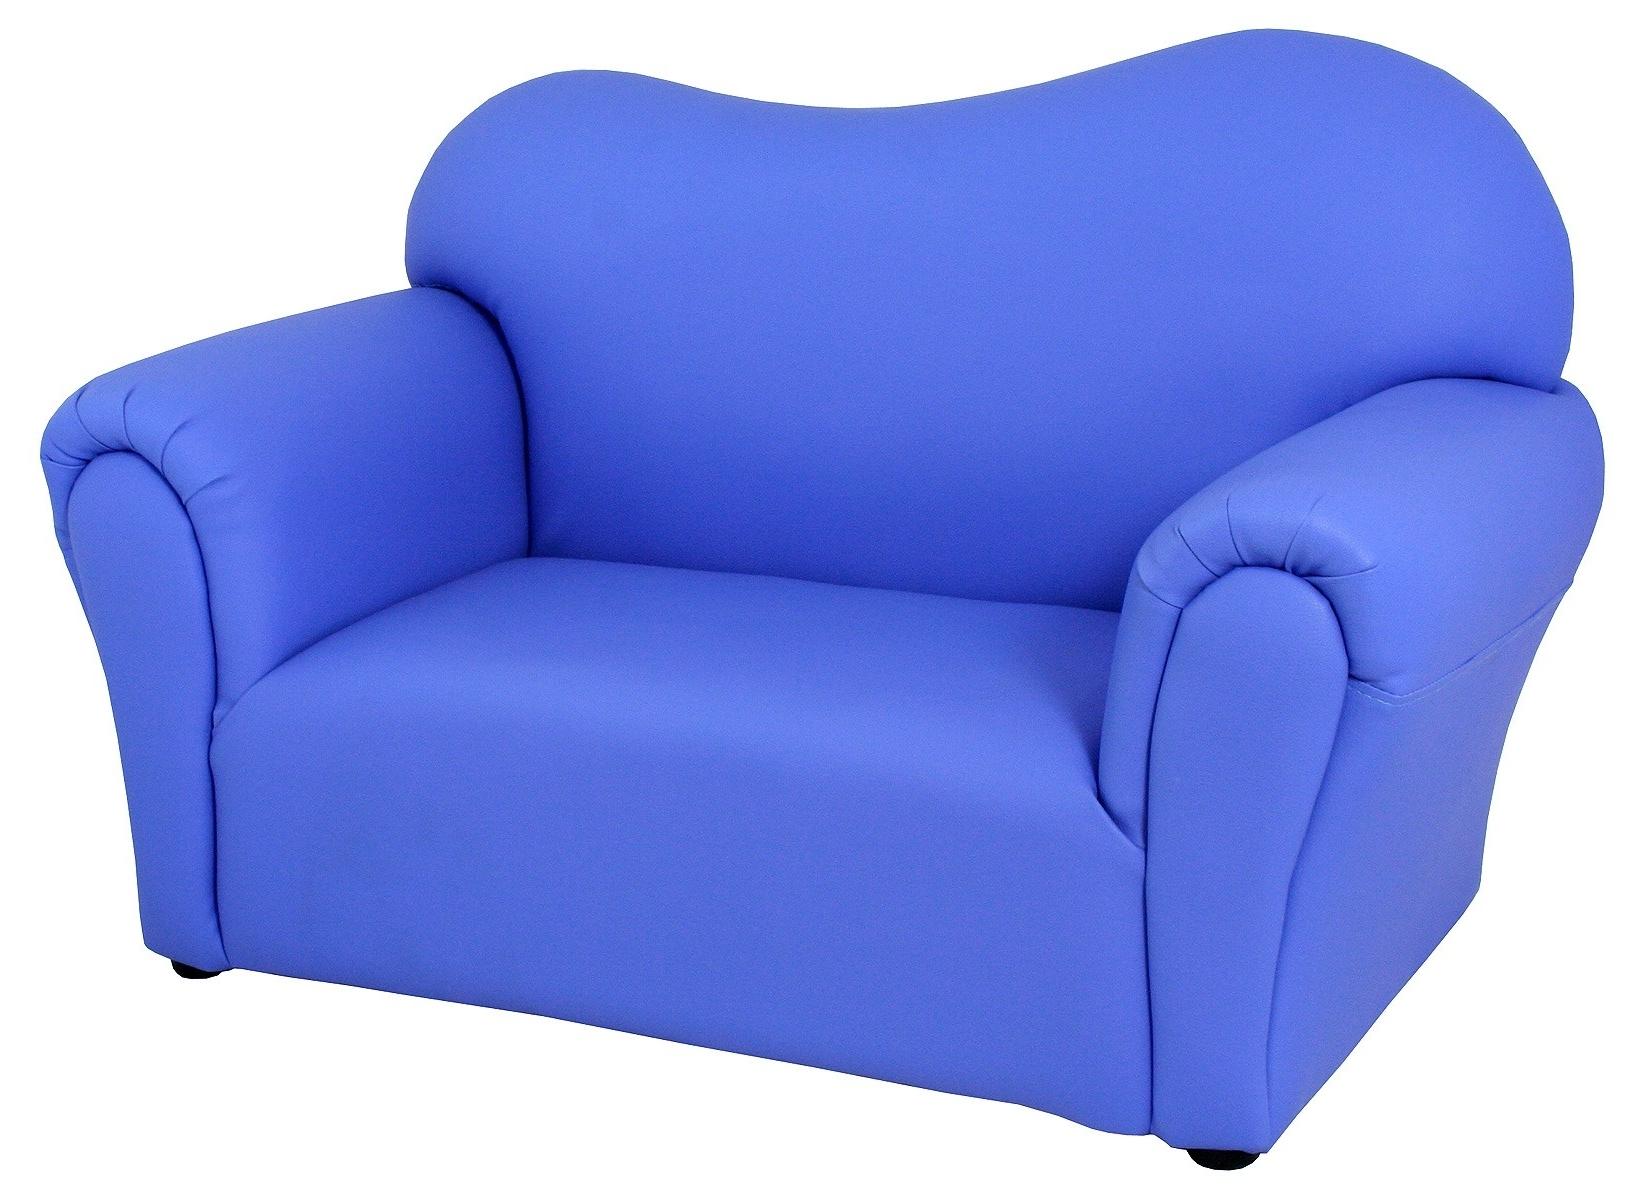 Recent Mini Sofas Pertaining To Childrens Blue Mini Sofa – Be Fabulous! (View 13 of 15)